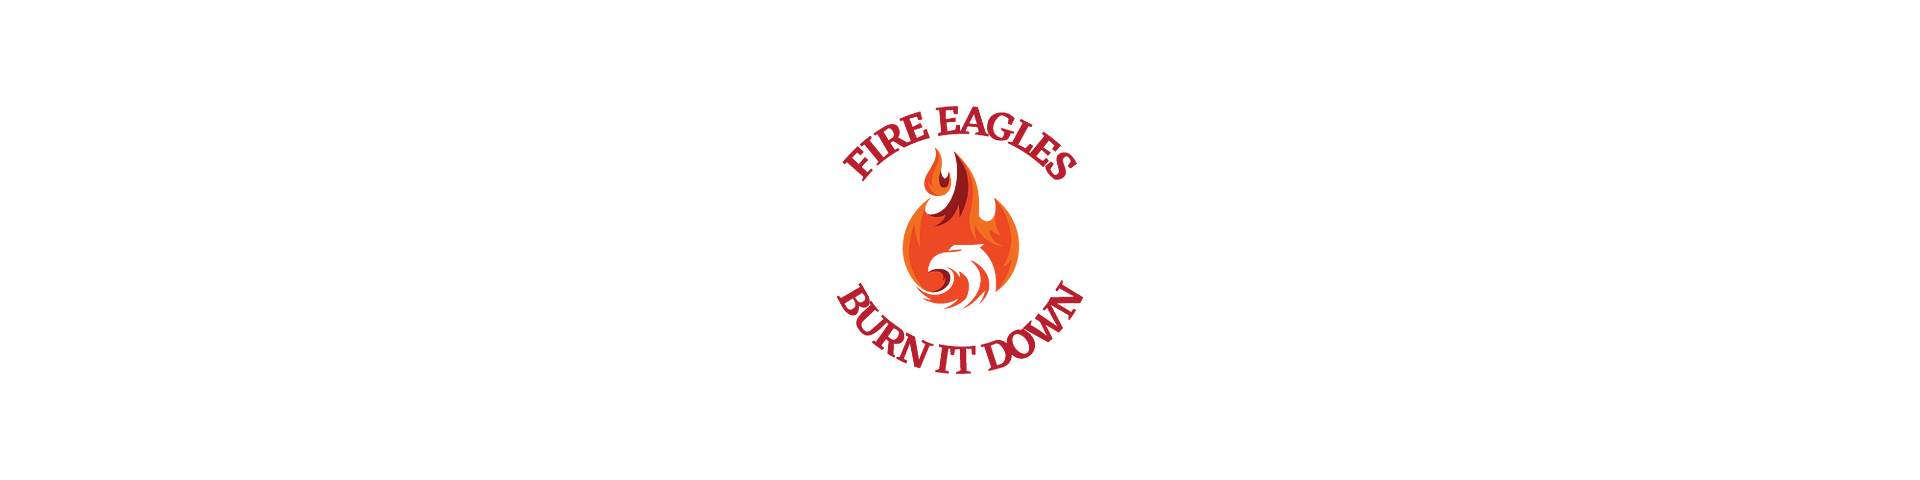 619th Fire Eagles S2